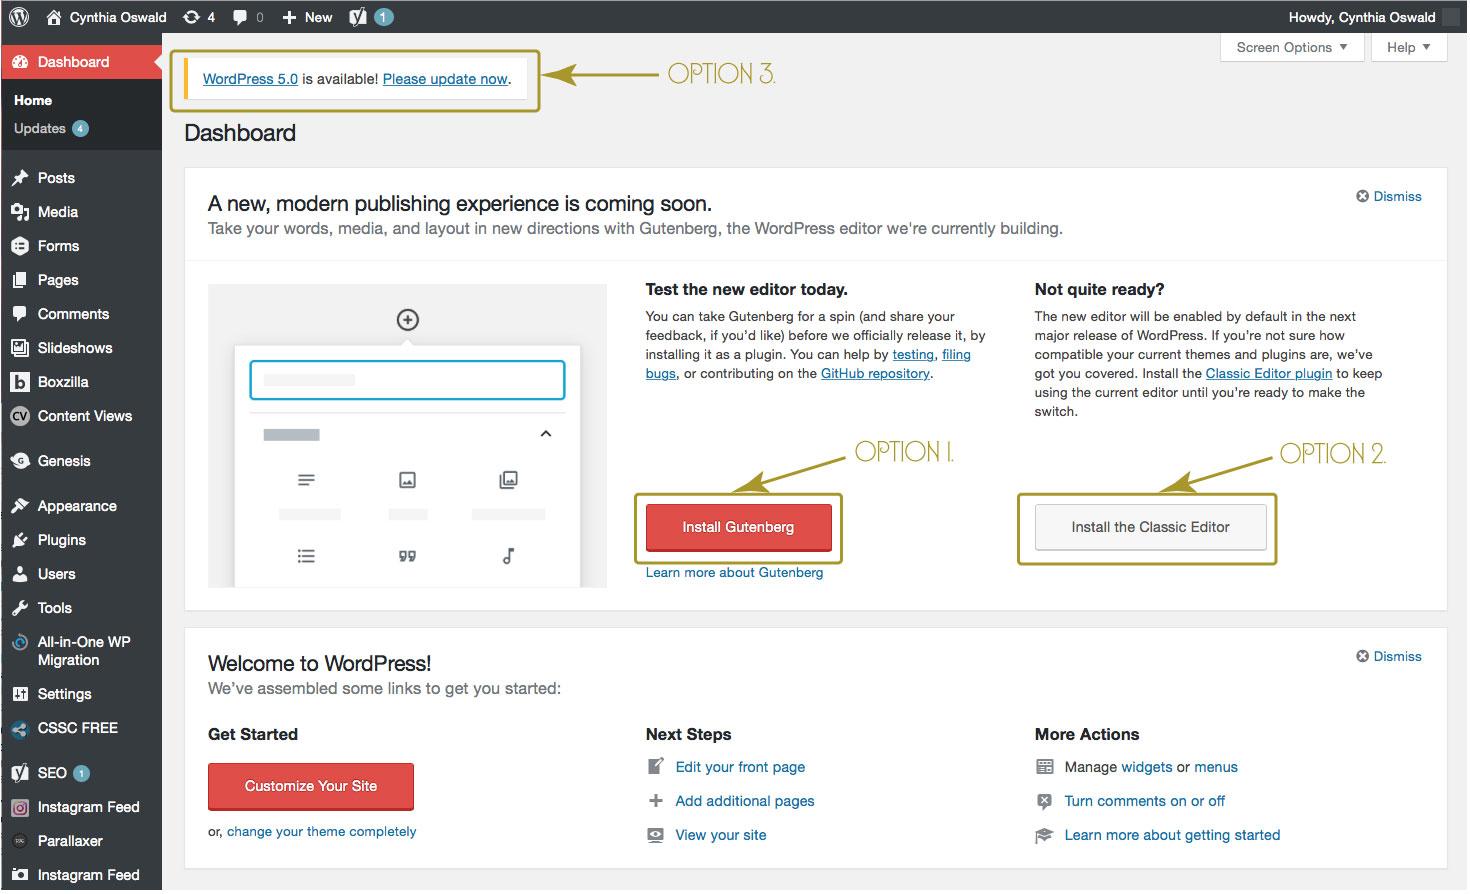 WordPress Update Options